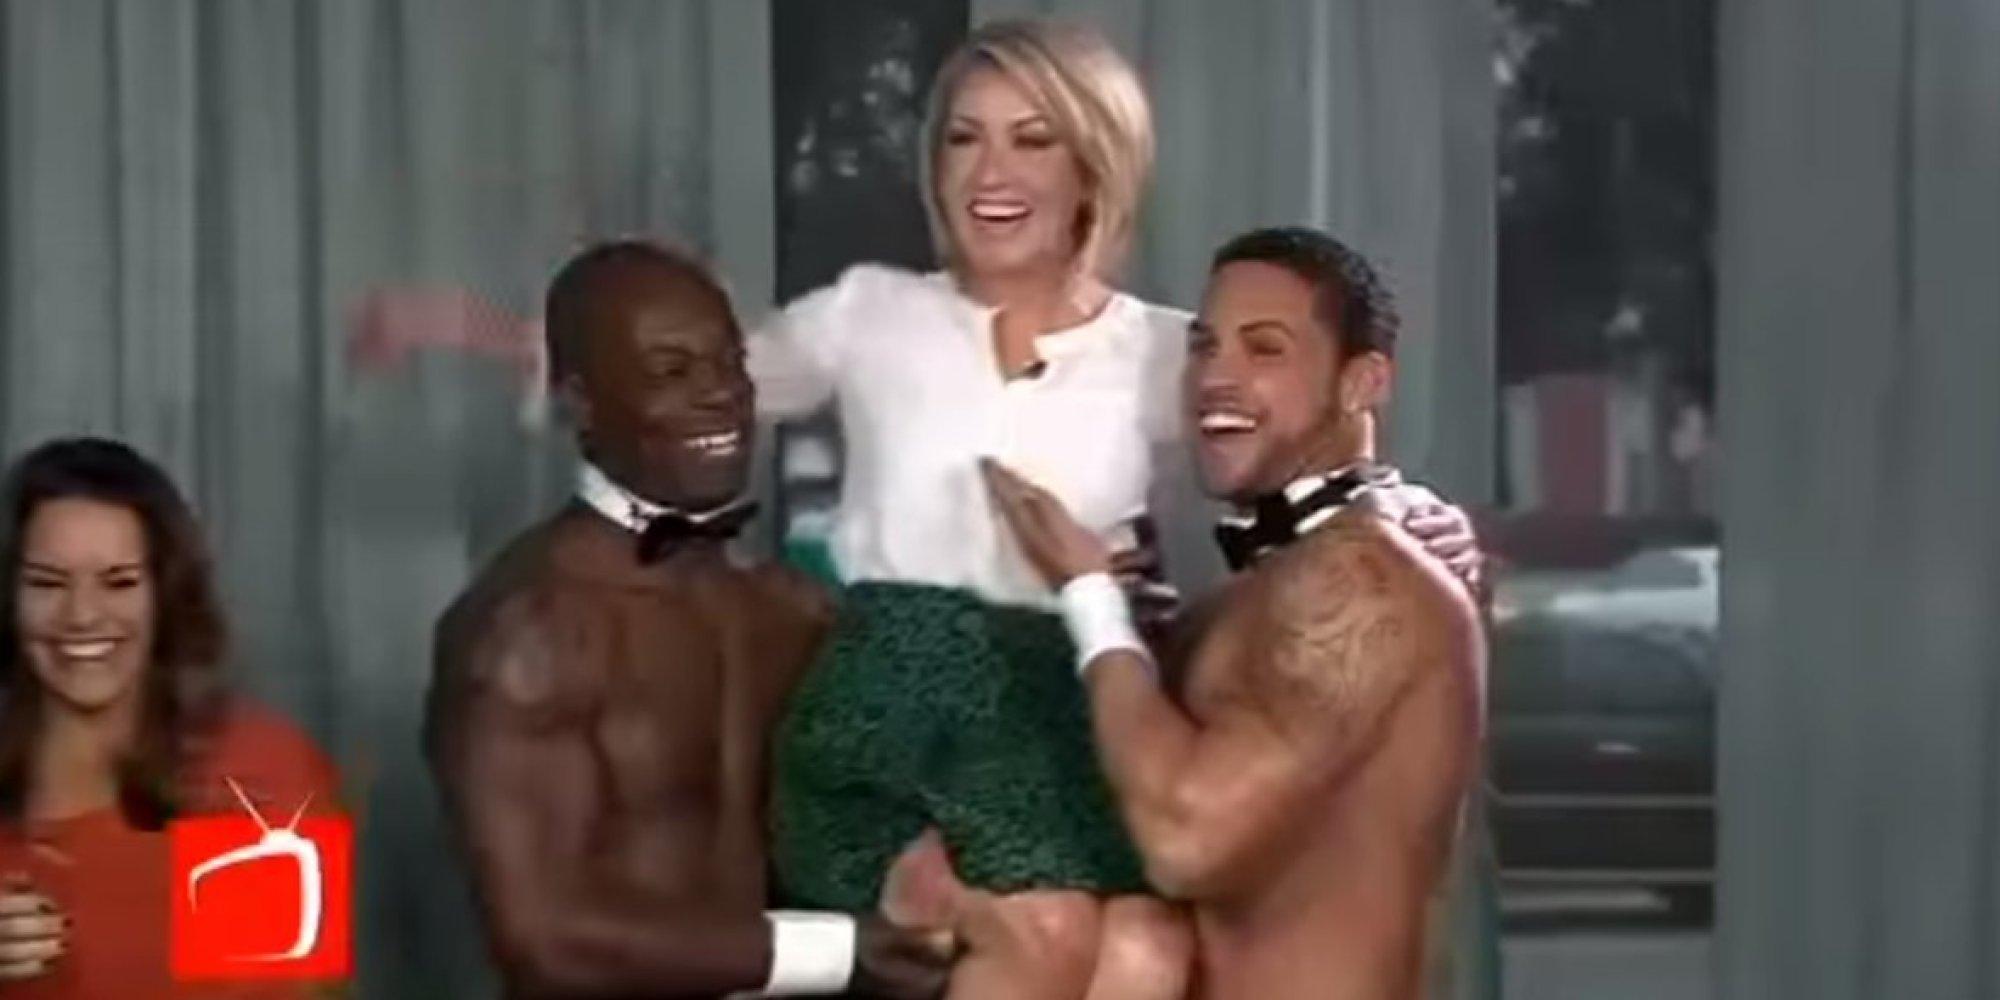 group of gay men sucking cock